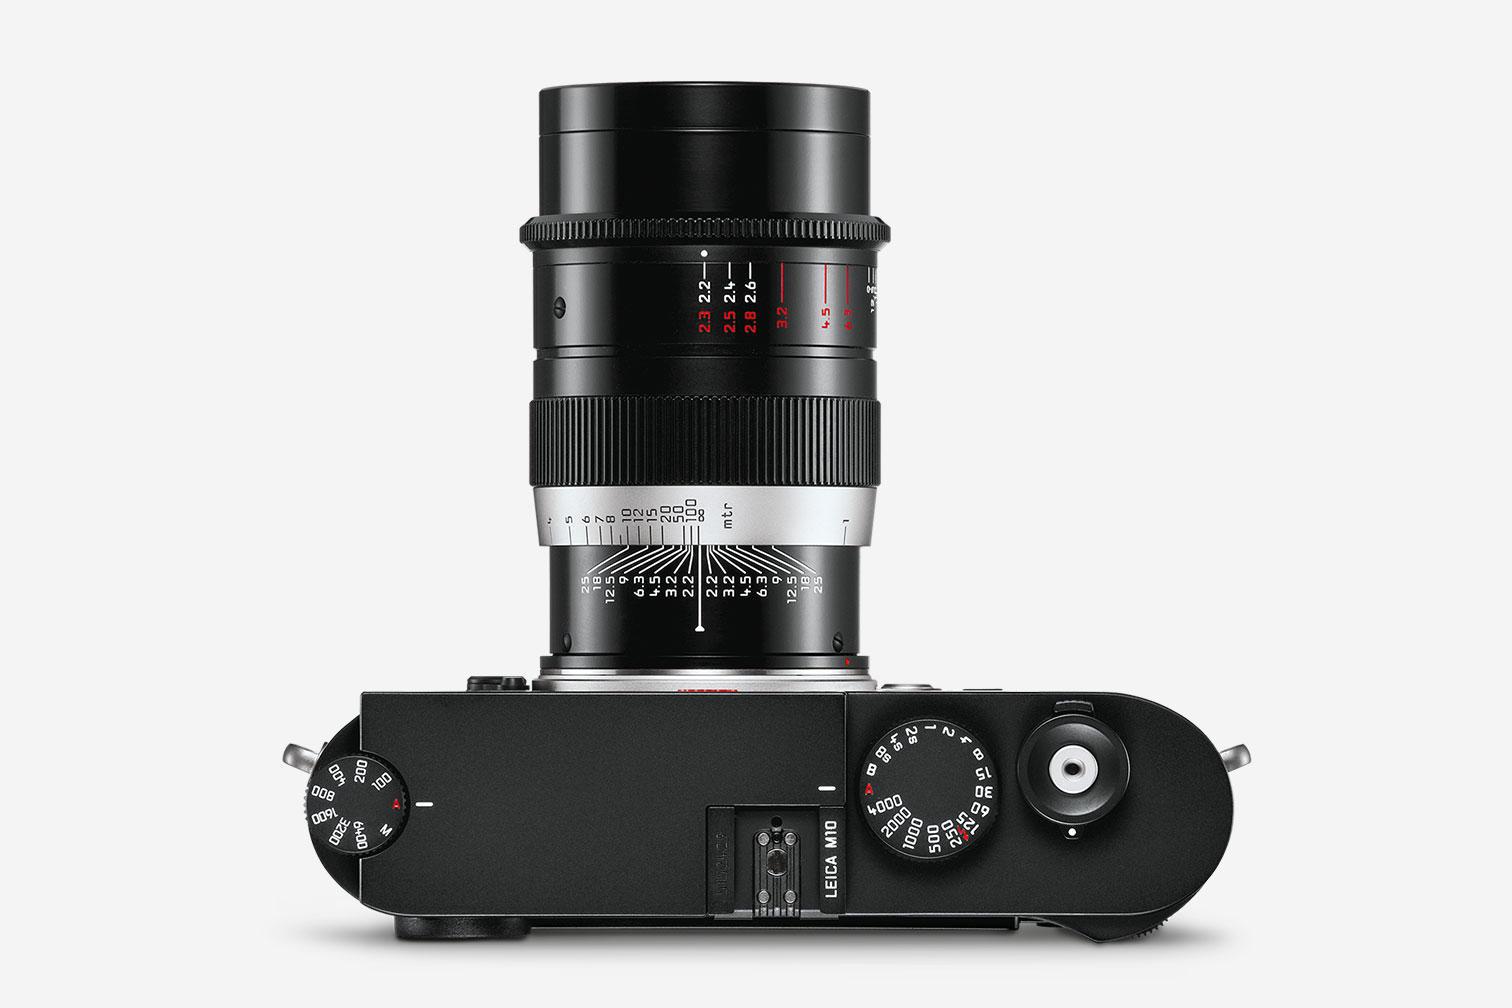 Leica Thambar M 90mm f/2.2 на камере